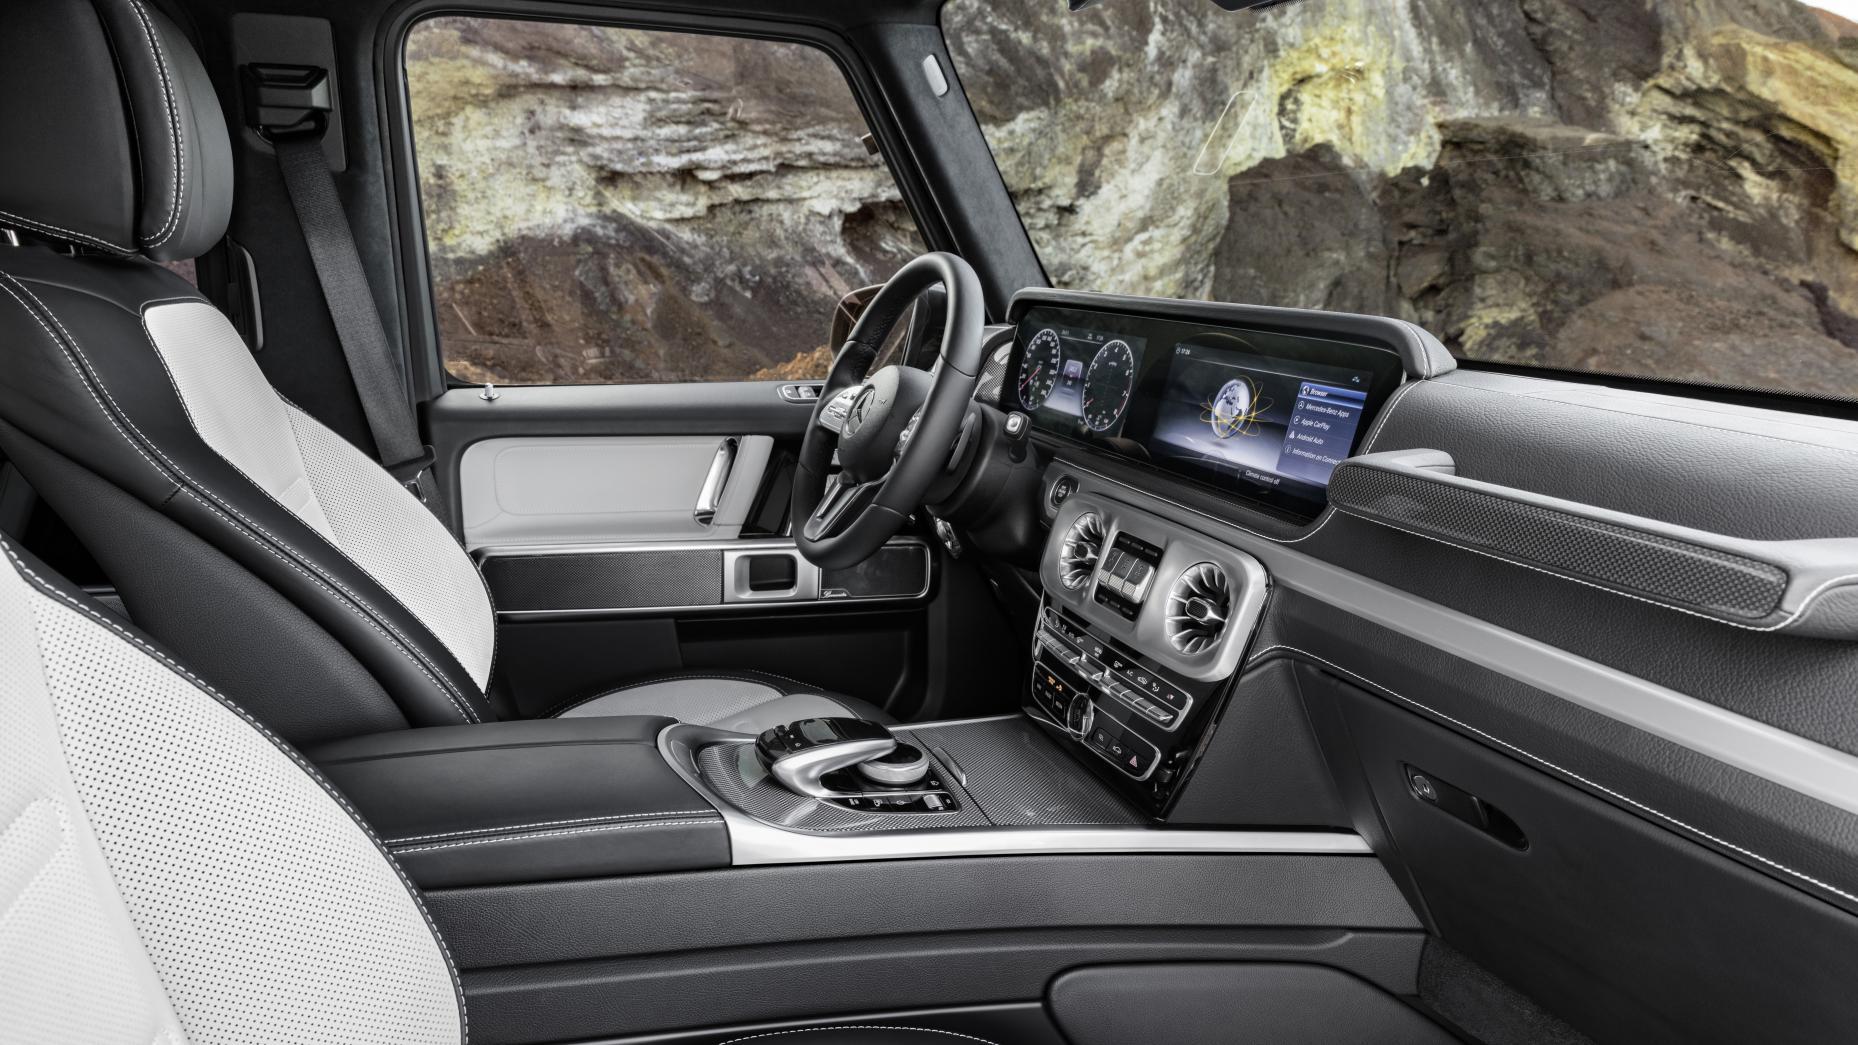 Nieuwe Mercedes G-klasse (2018) - Dit is het interieur - TopGear